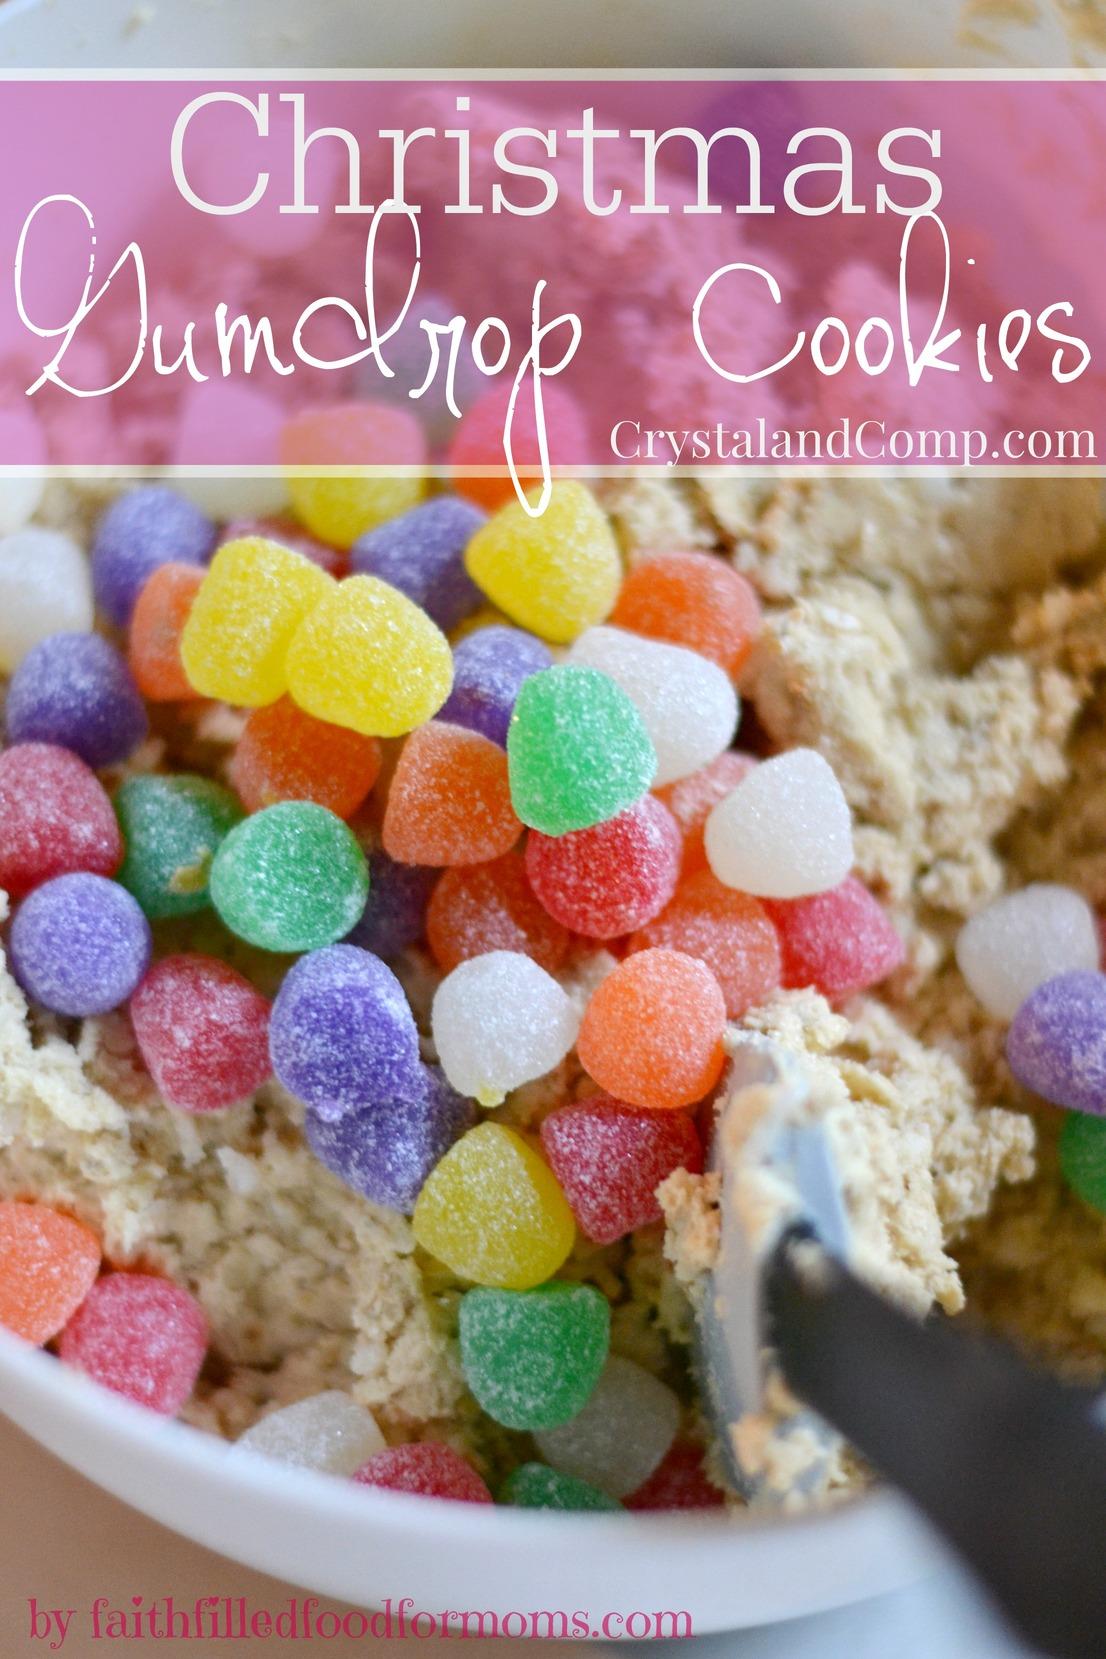 Christmas Gumdrop Cookies | CrystalandComp.com